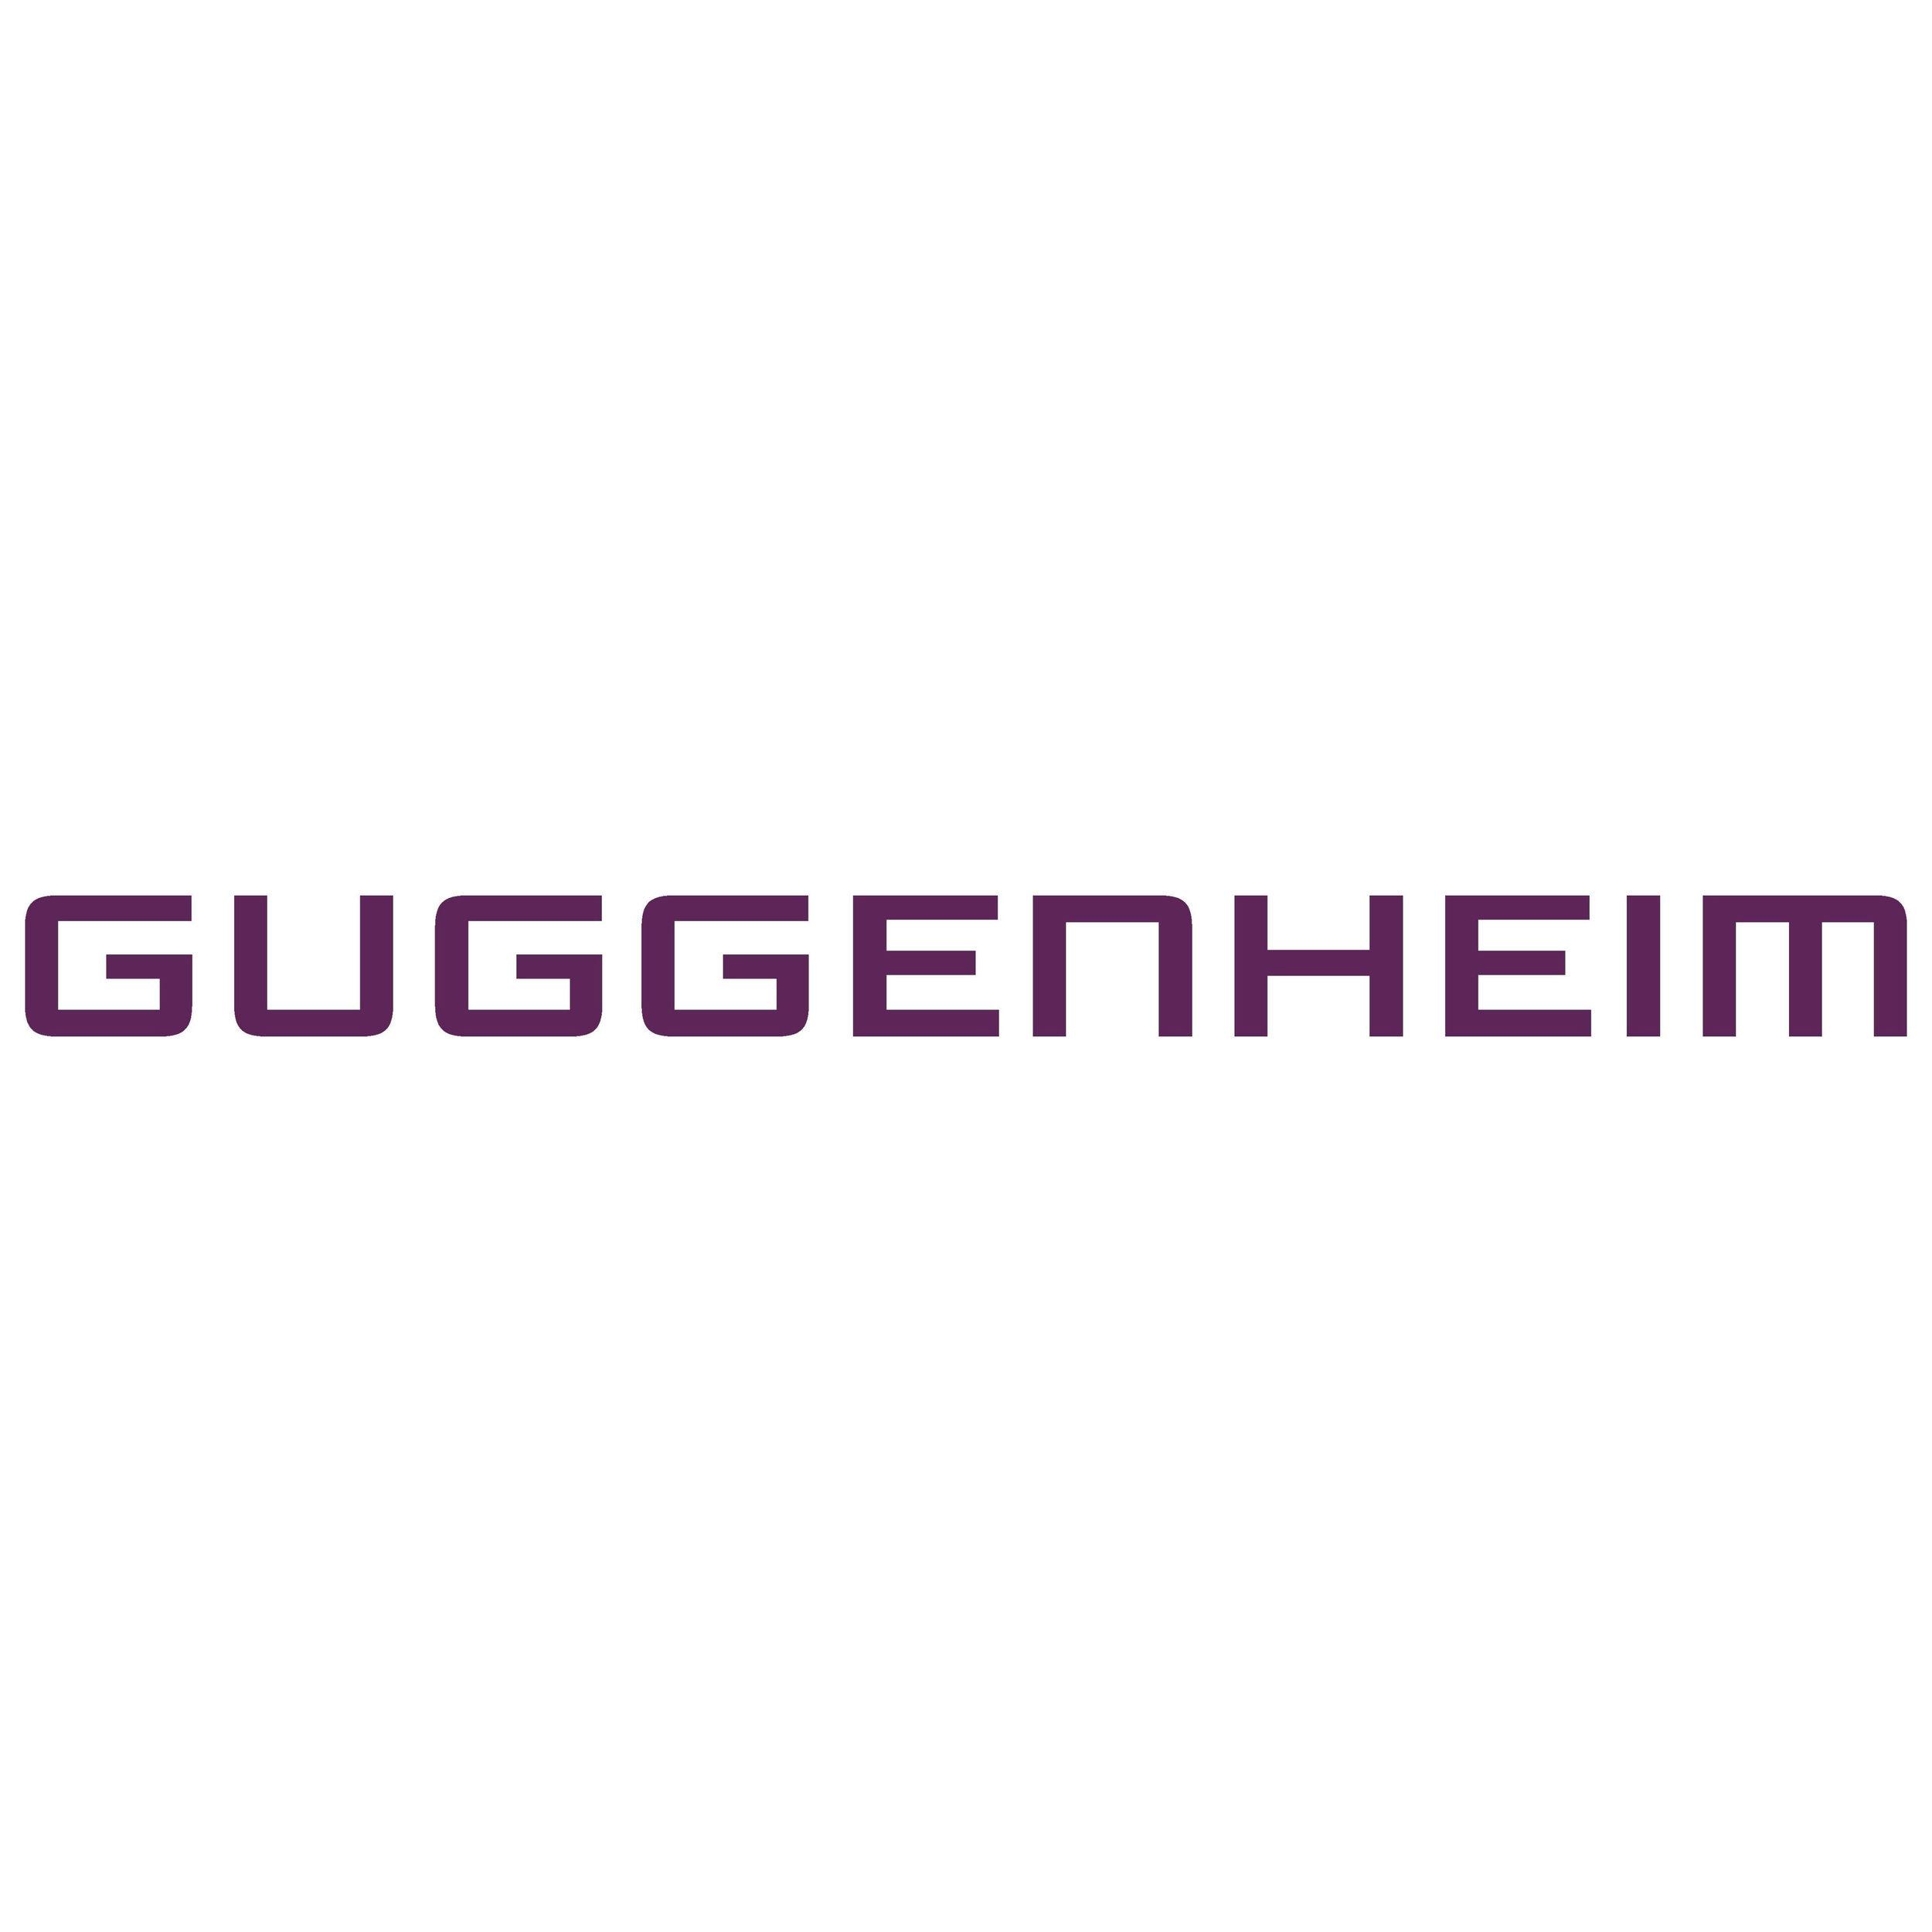 guggenheim-.jpg